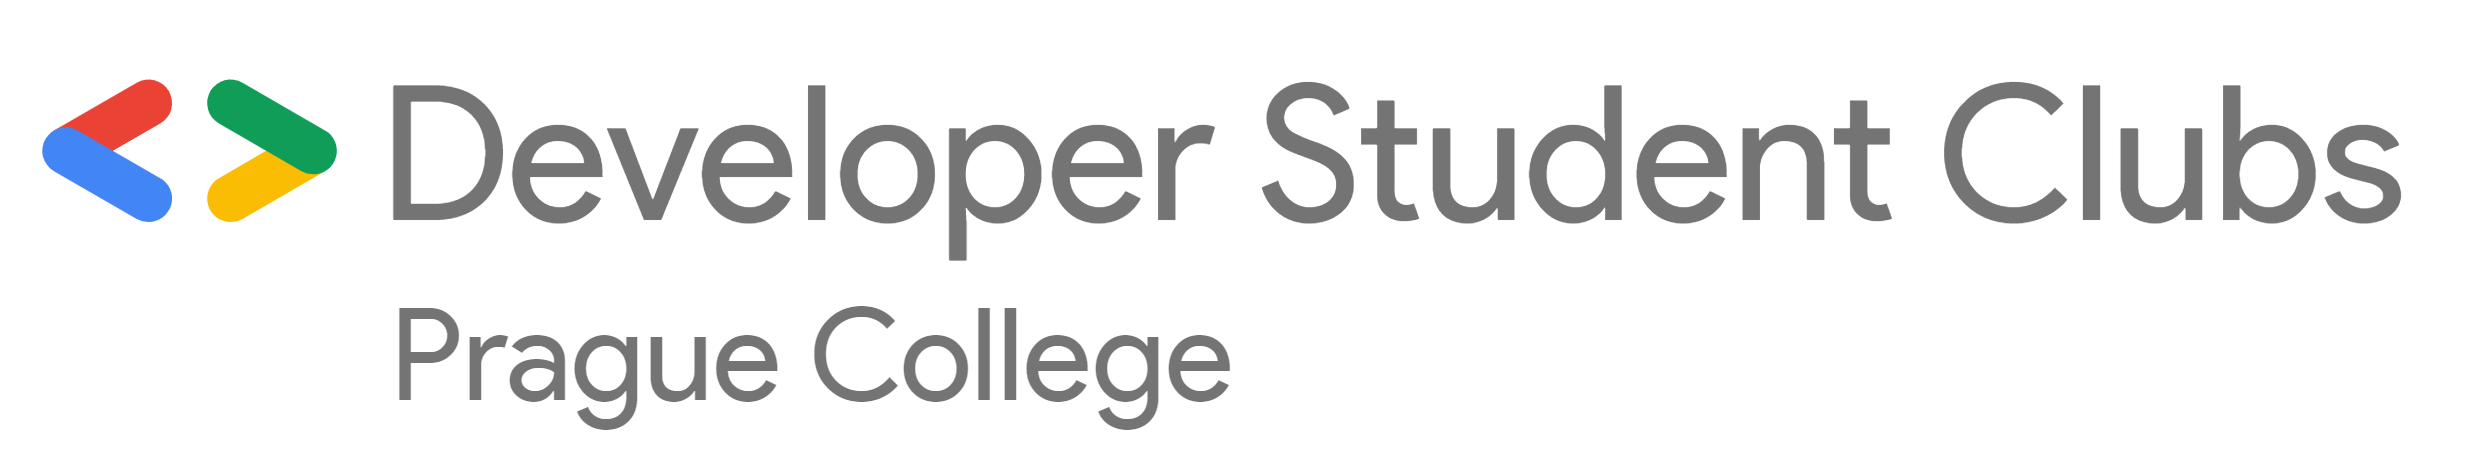 D4188FBF-71BF-4F19-BD9D-DBB7A7697149-1